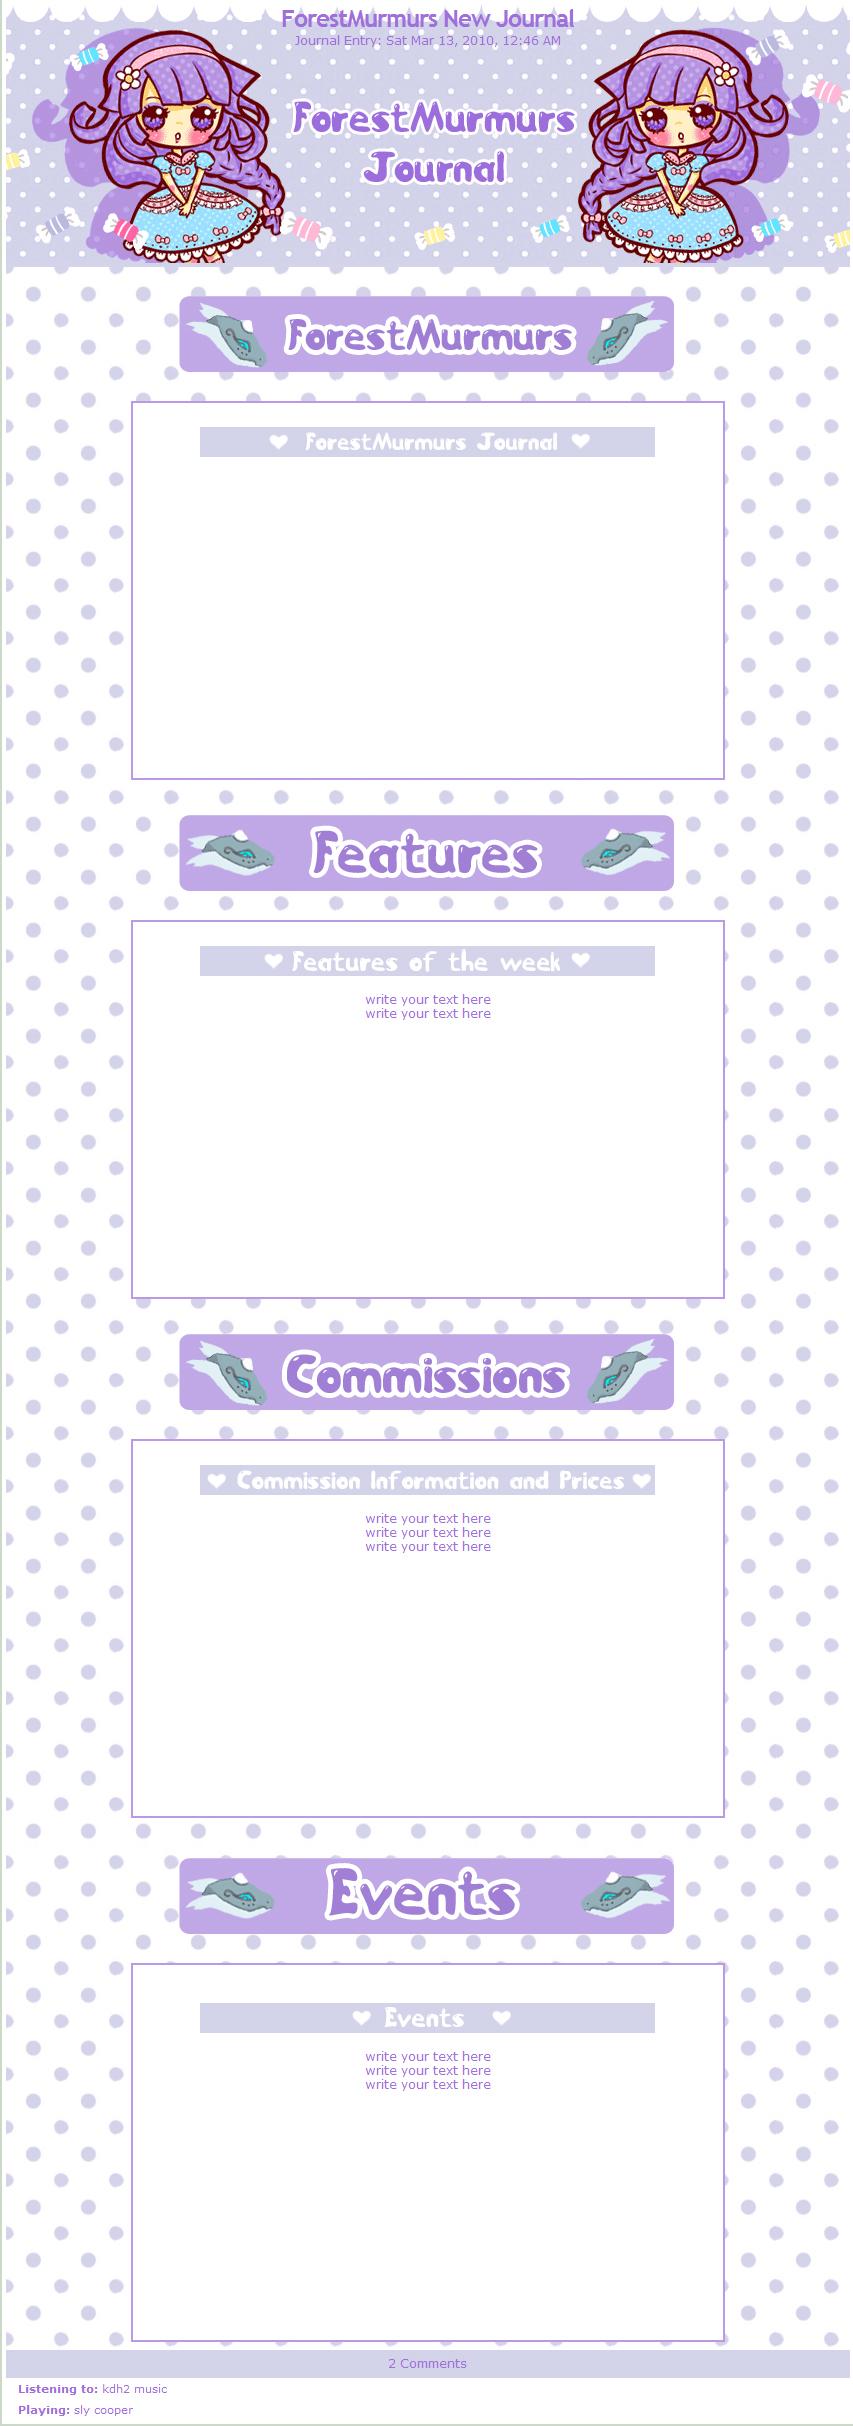 ForestMurmurs kawaii Journal by miemie-chan3